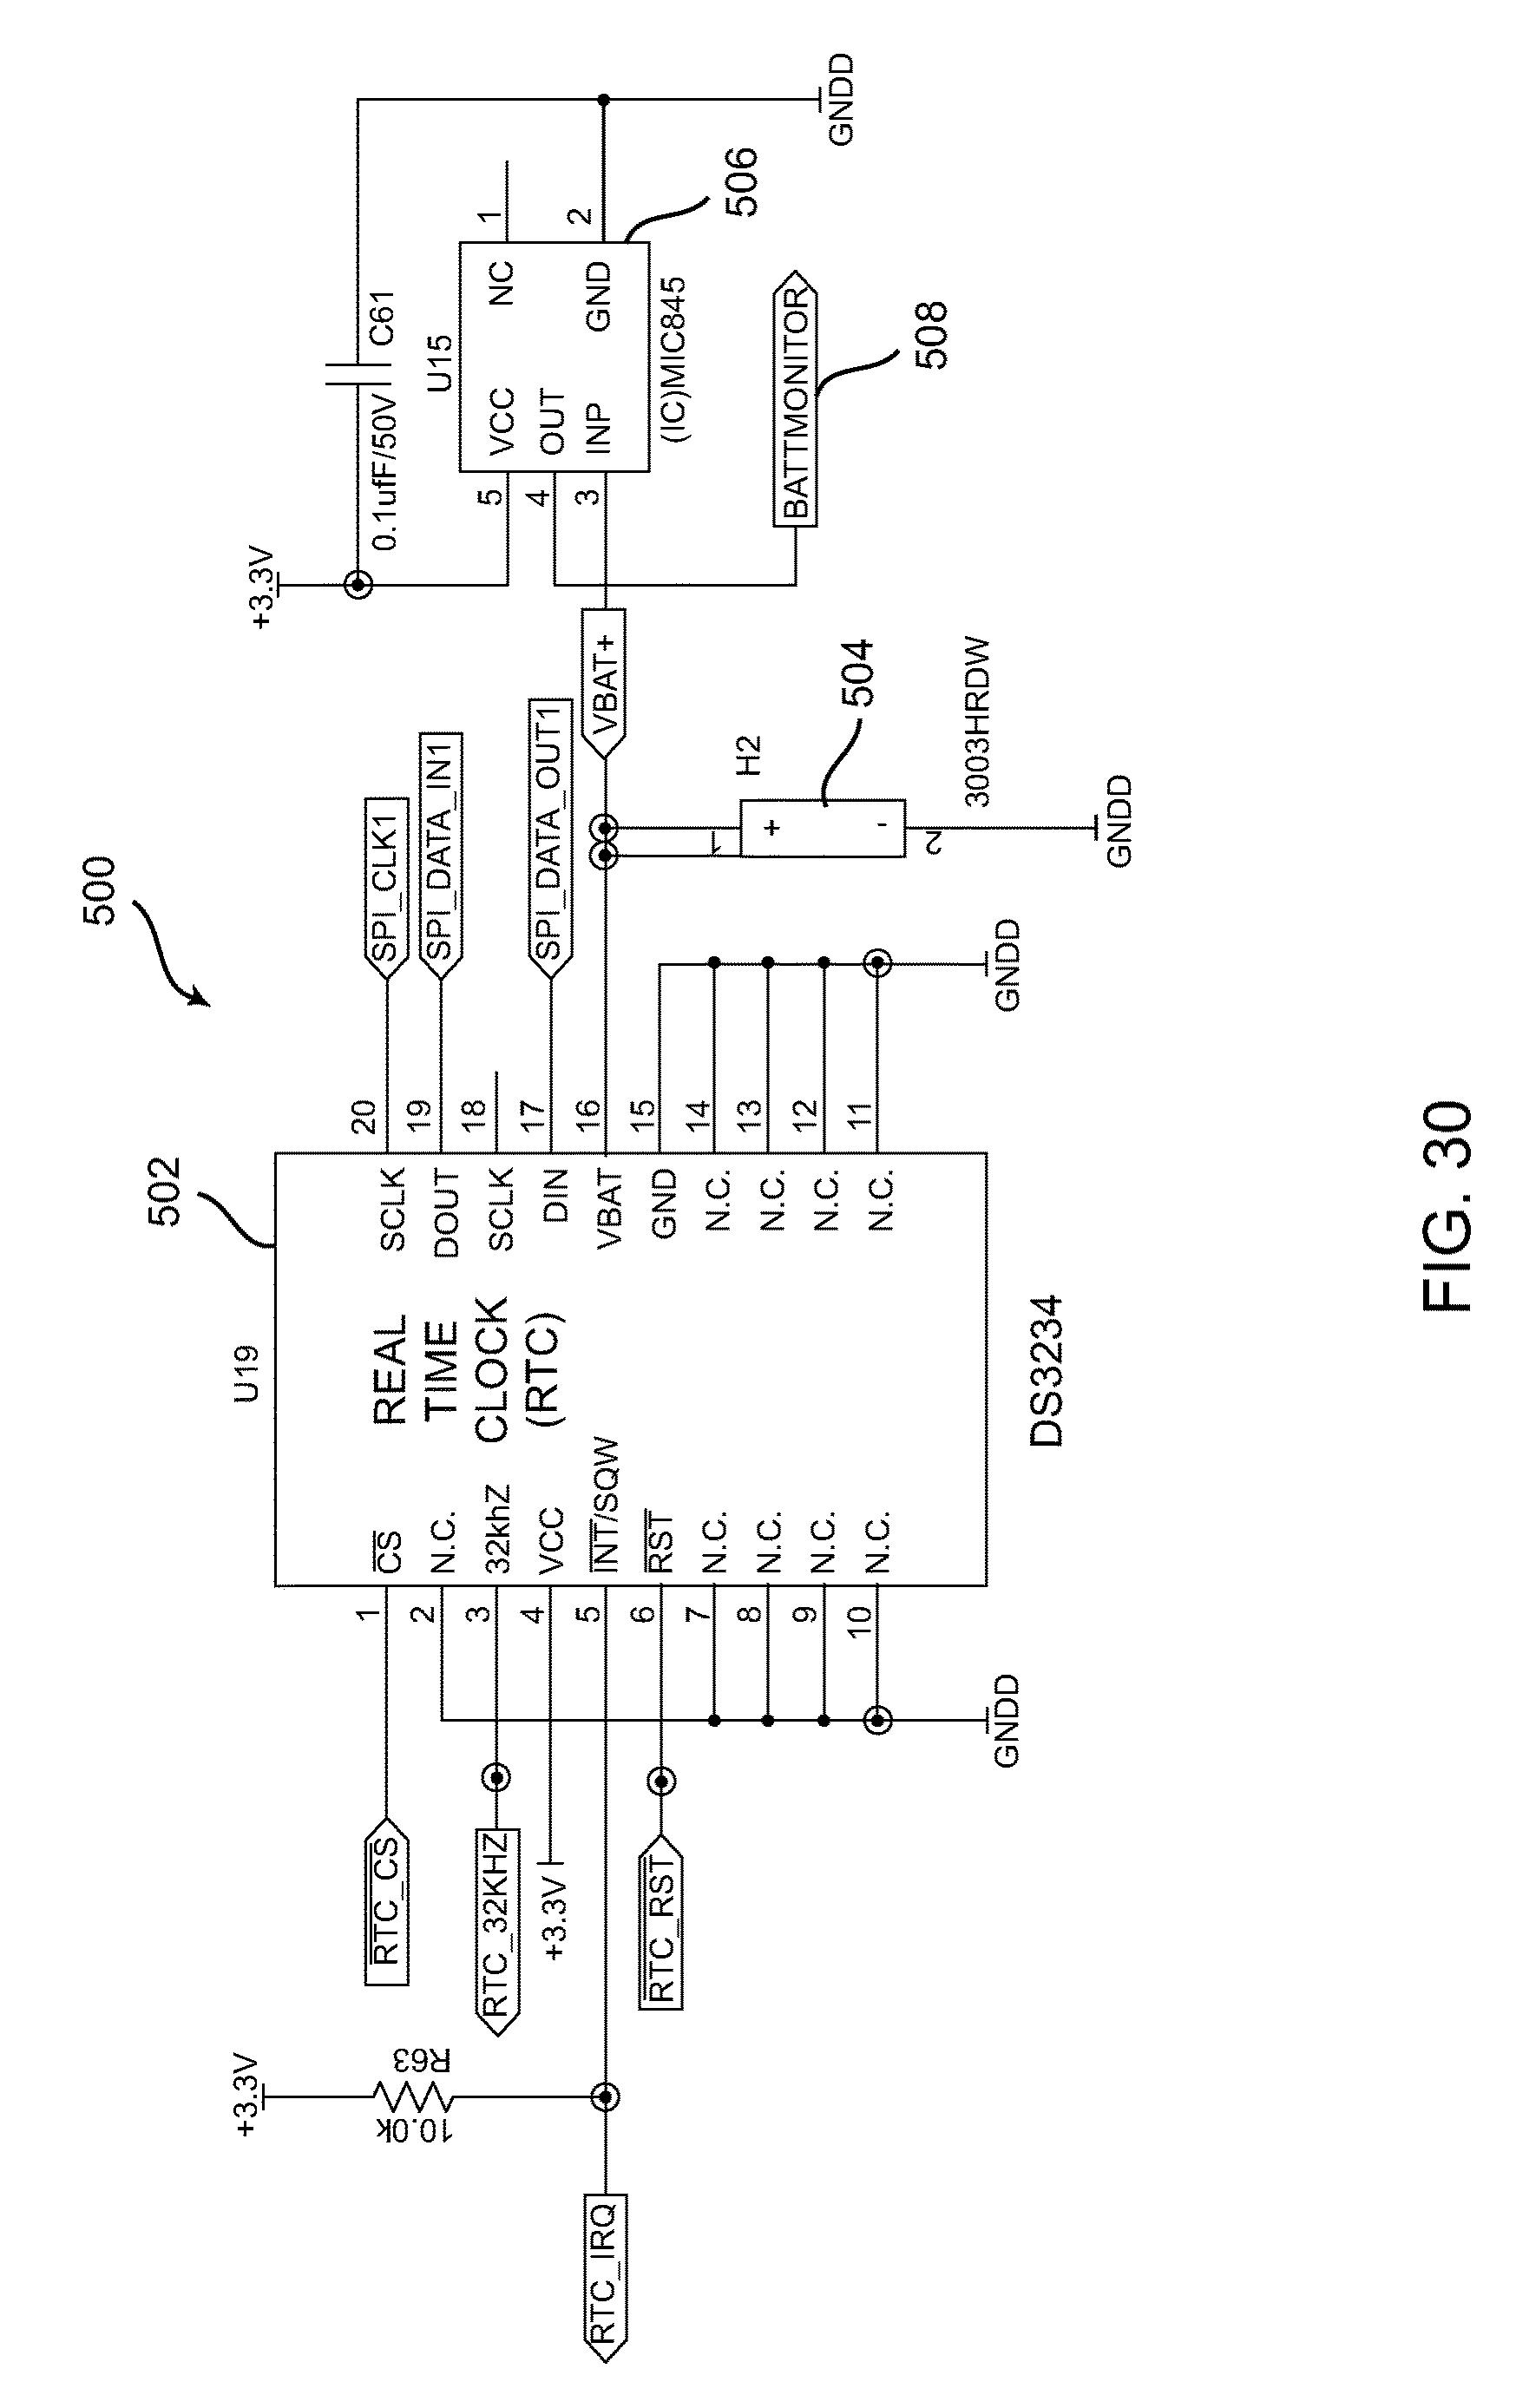 Model G 533 Motor 3 4 Hp Wiri Wiring Diagram